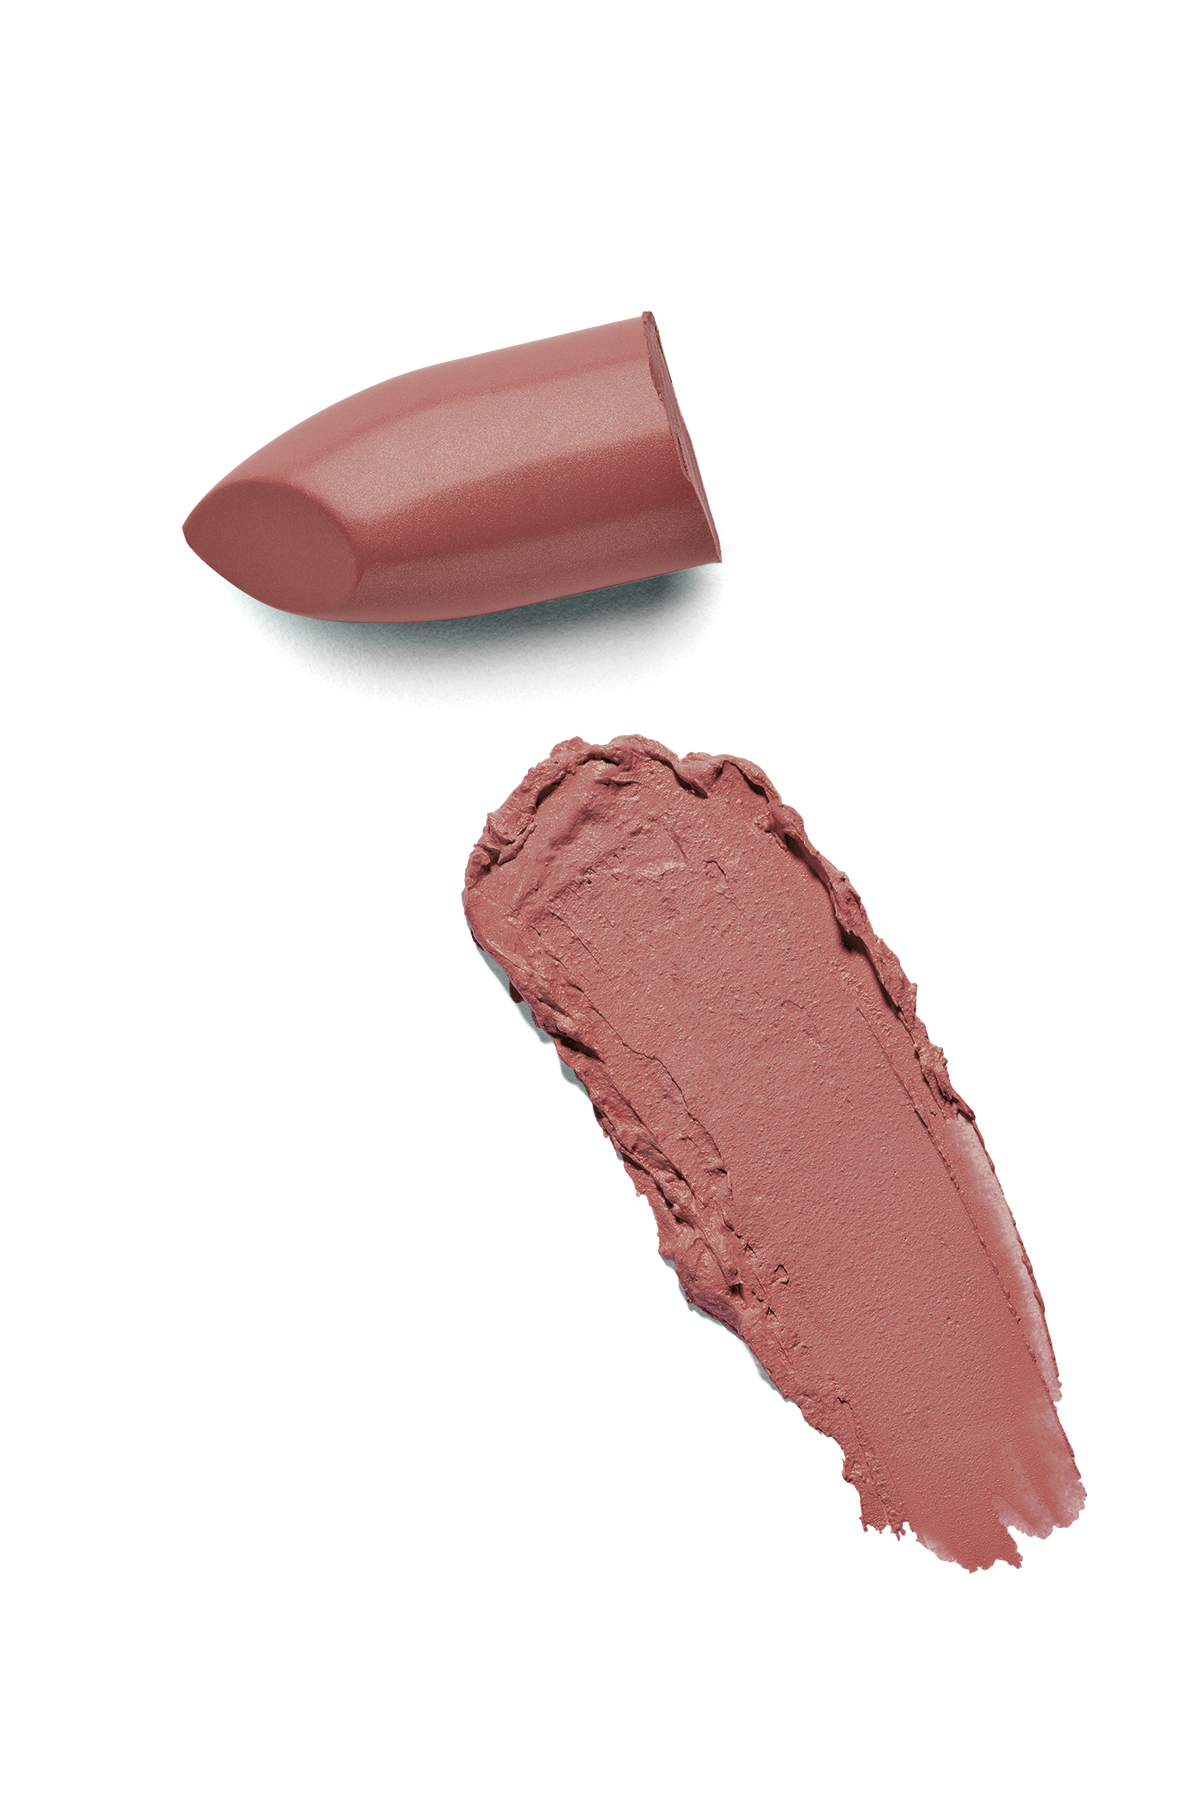 Matte Lipstick - 183 -Lipstick Thumbnail